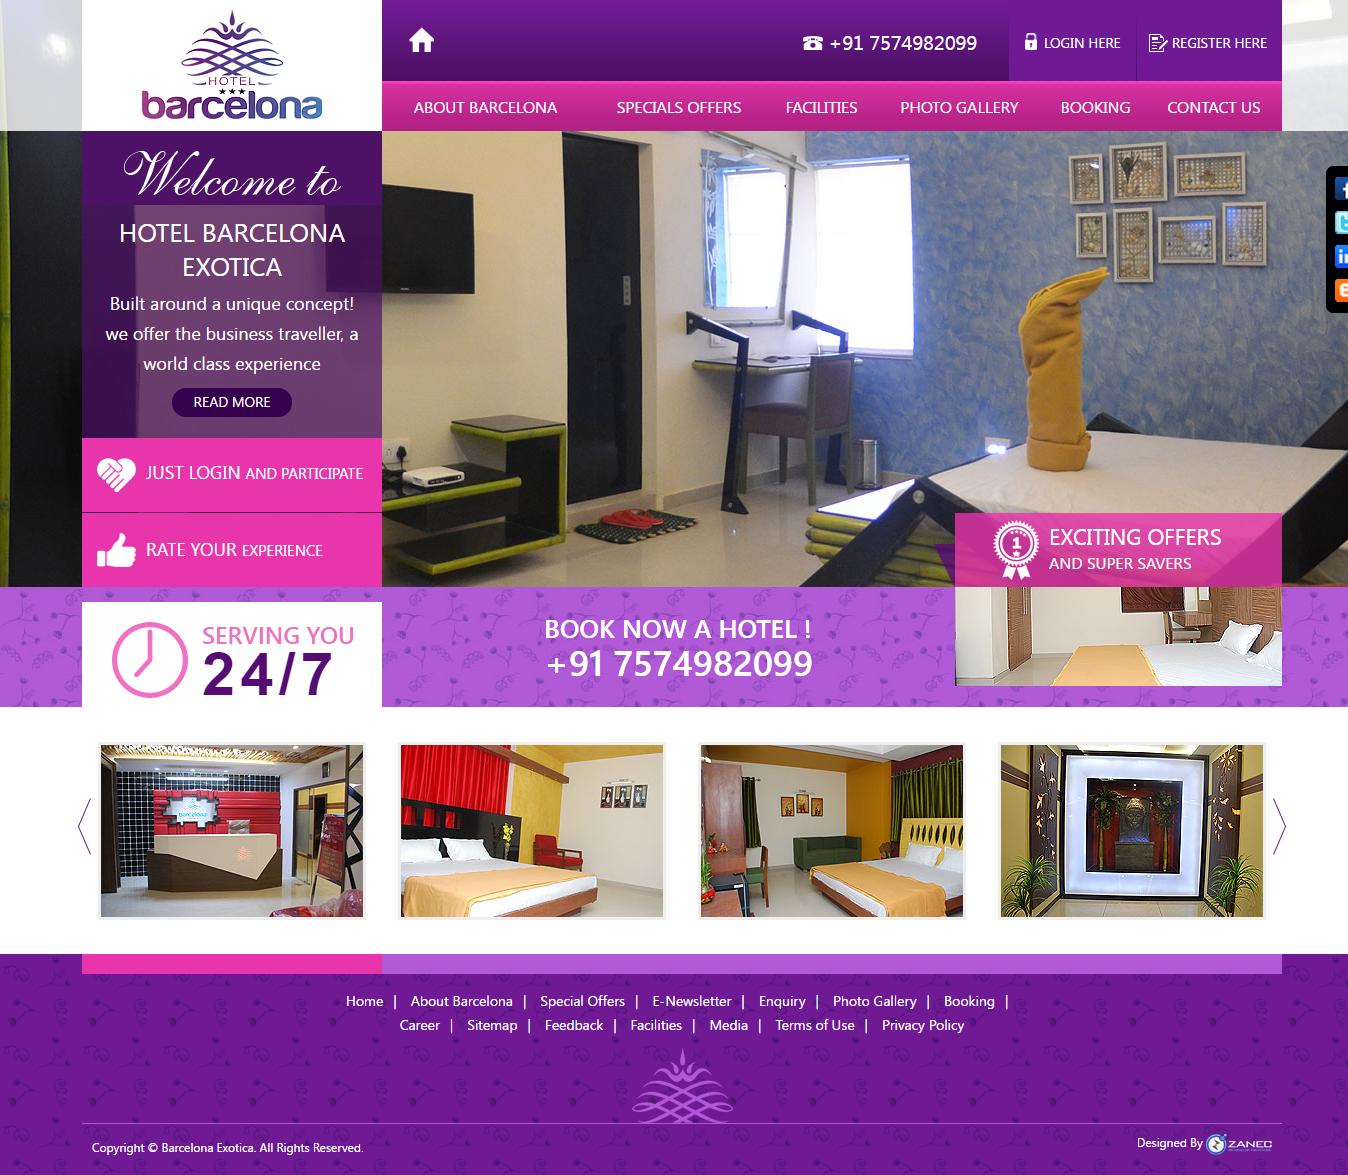 hotelbarcelonaexotica